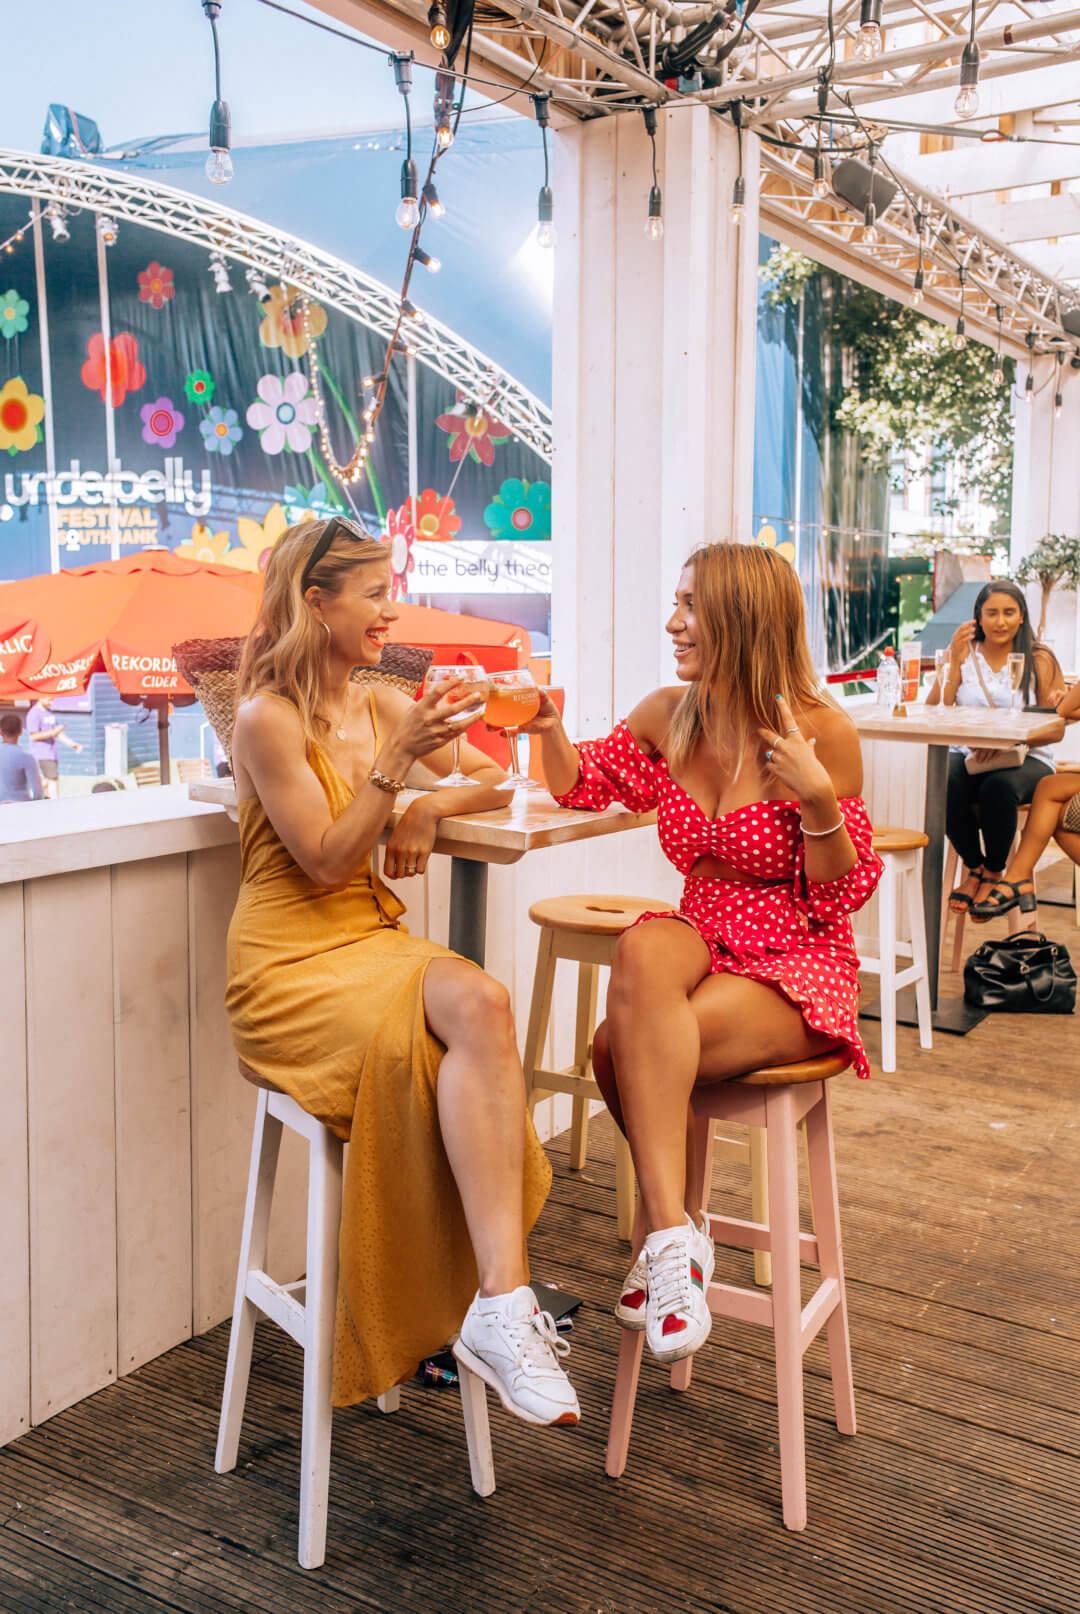 Rekorderling Bar Southbank London